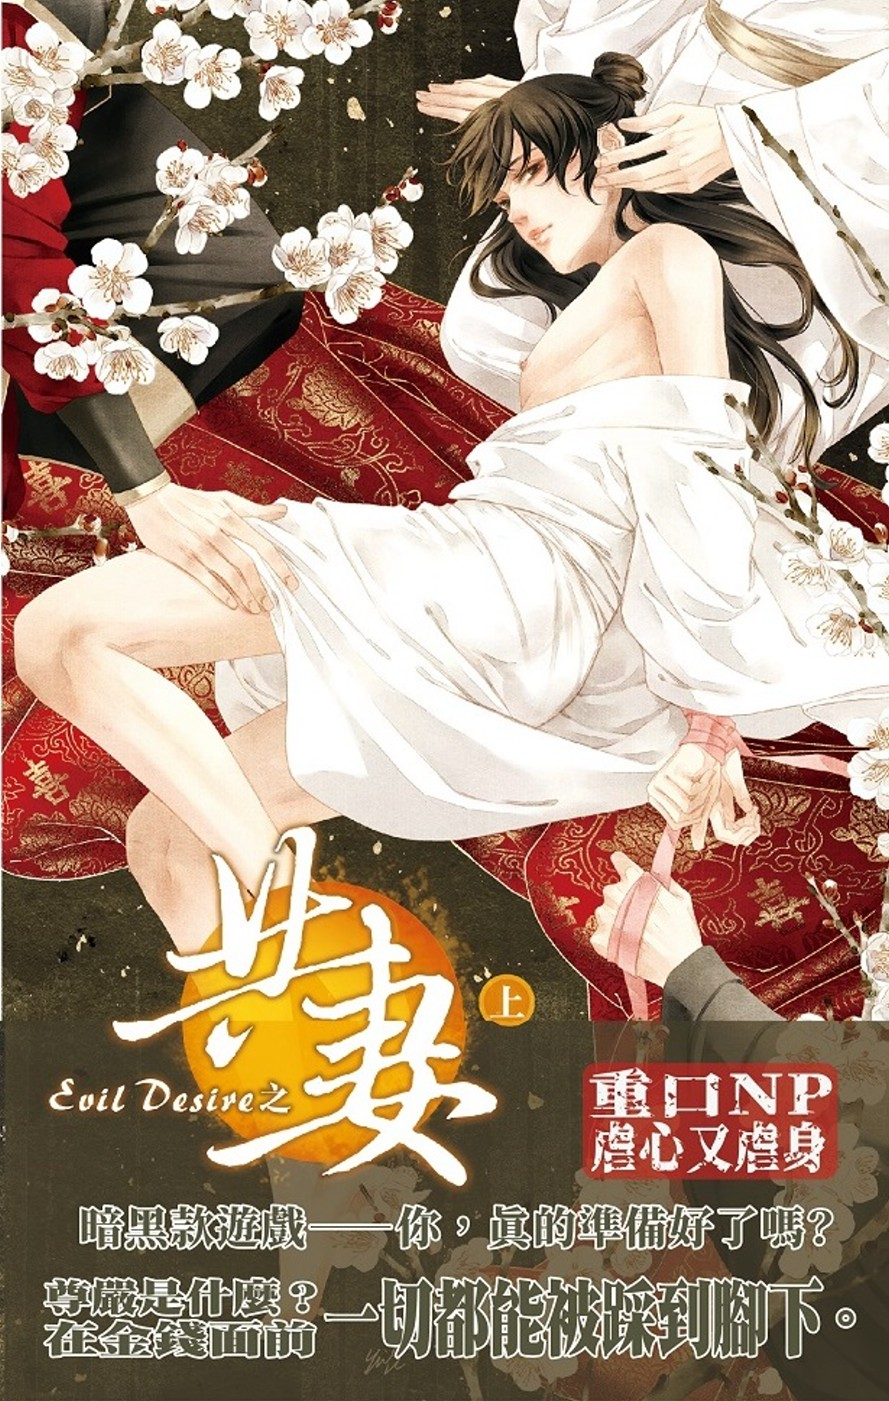 Evil Desire 之 共妻 (上)